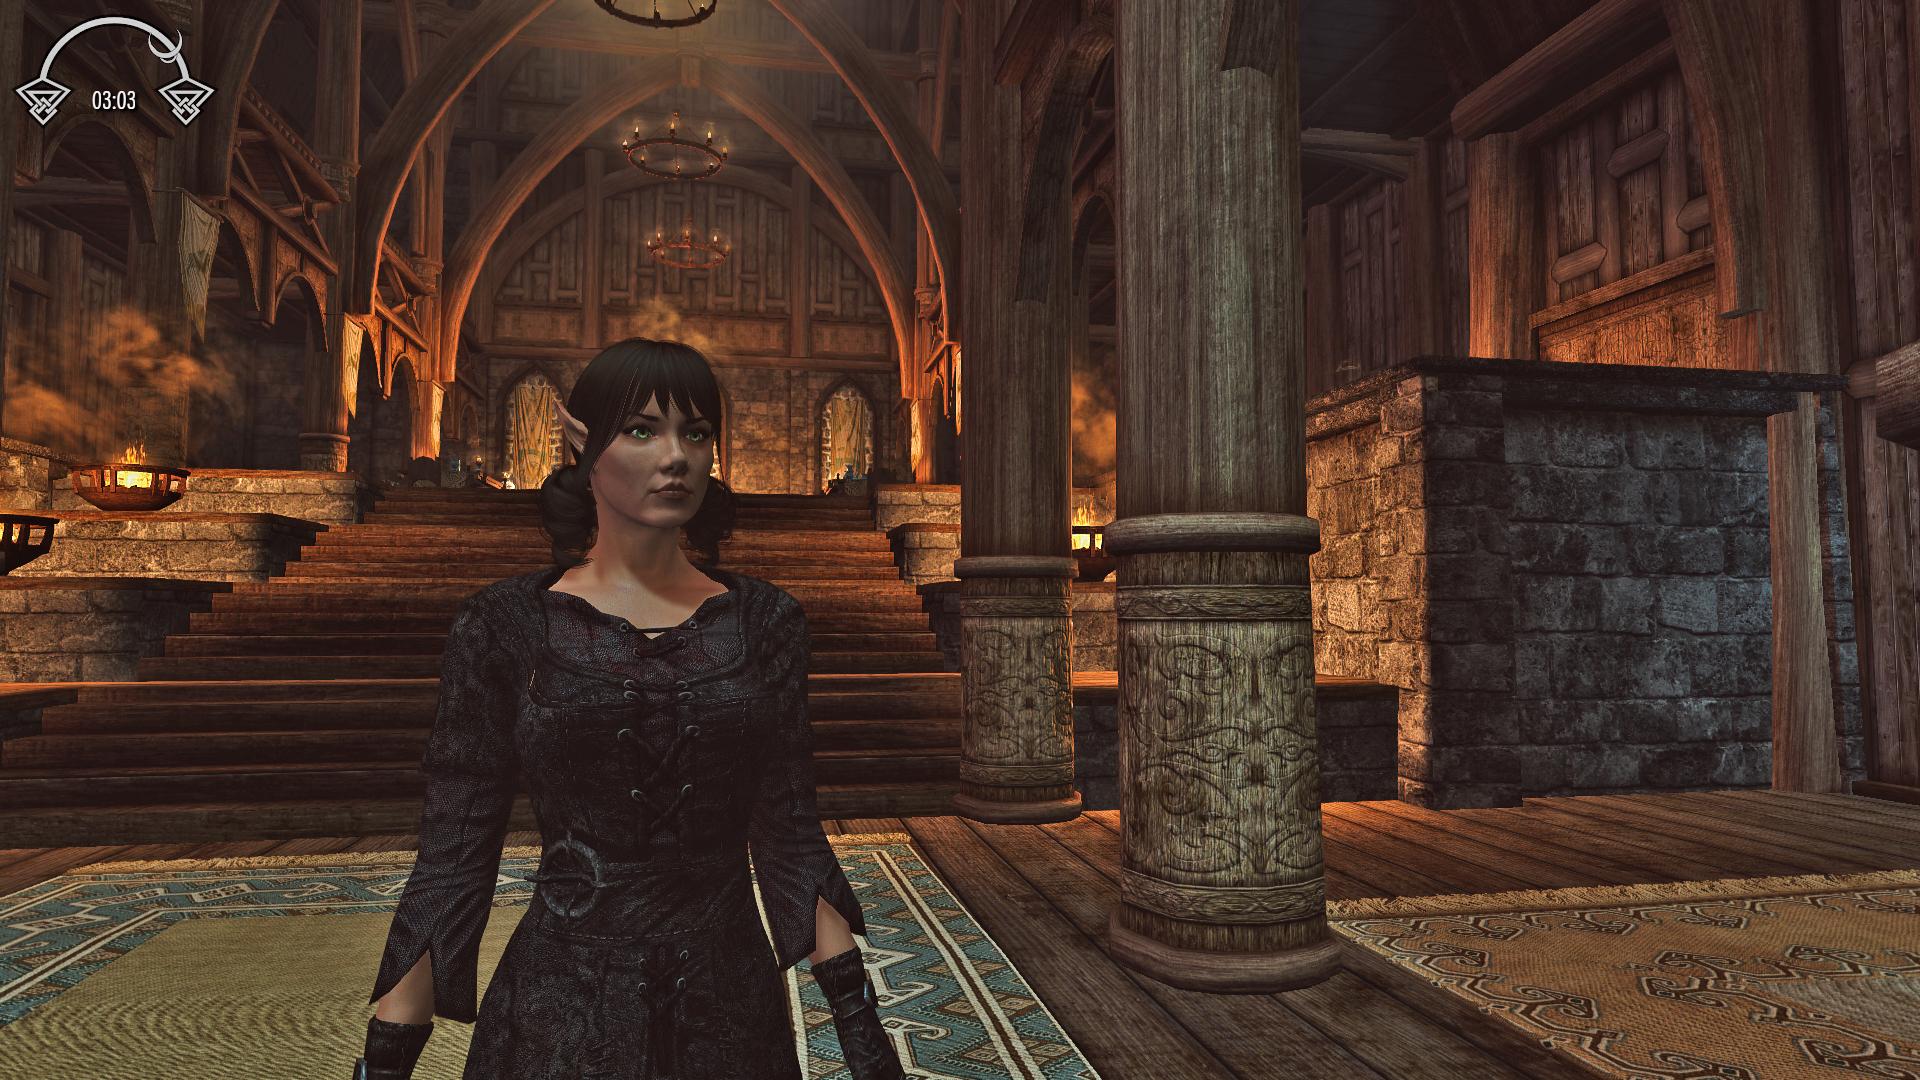 Elf-000.jpg - Elder Scrolls 5: Skyrim, the